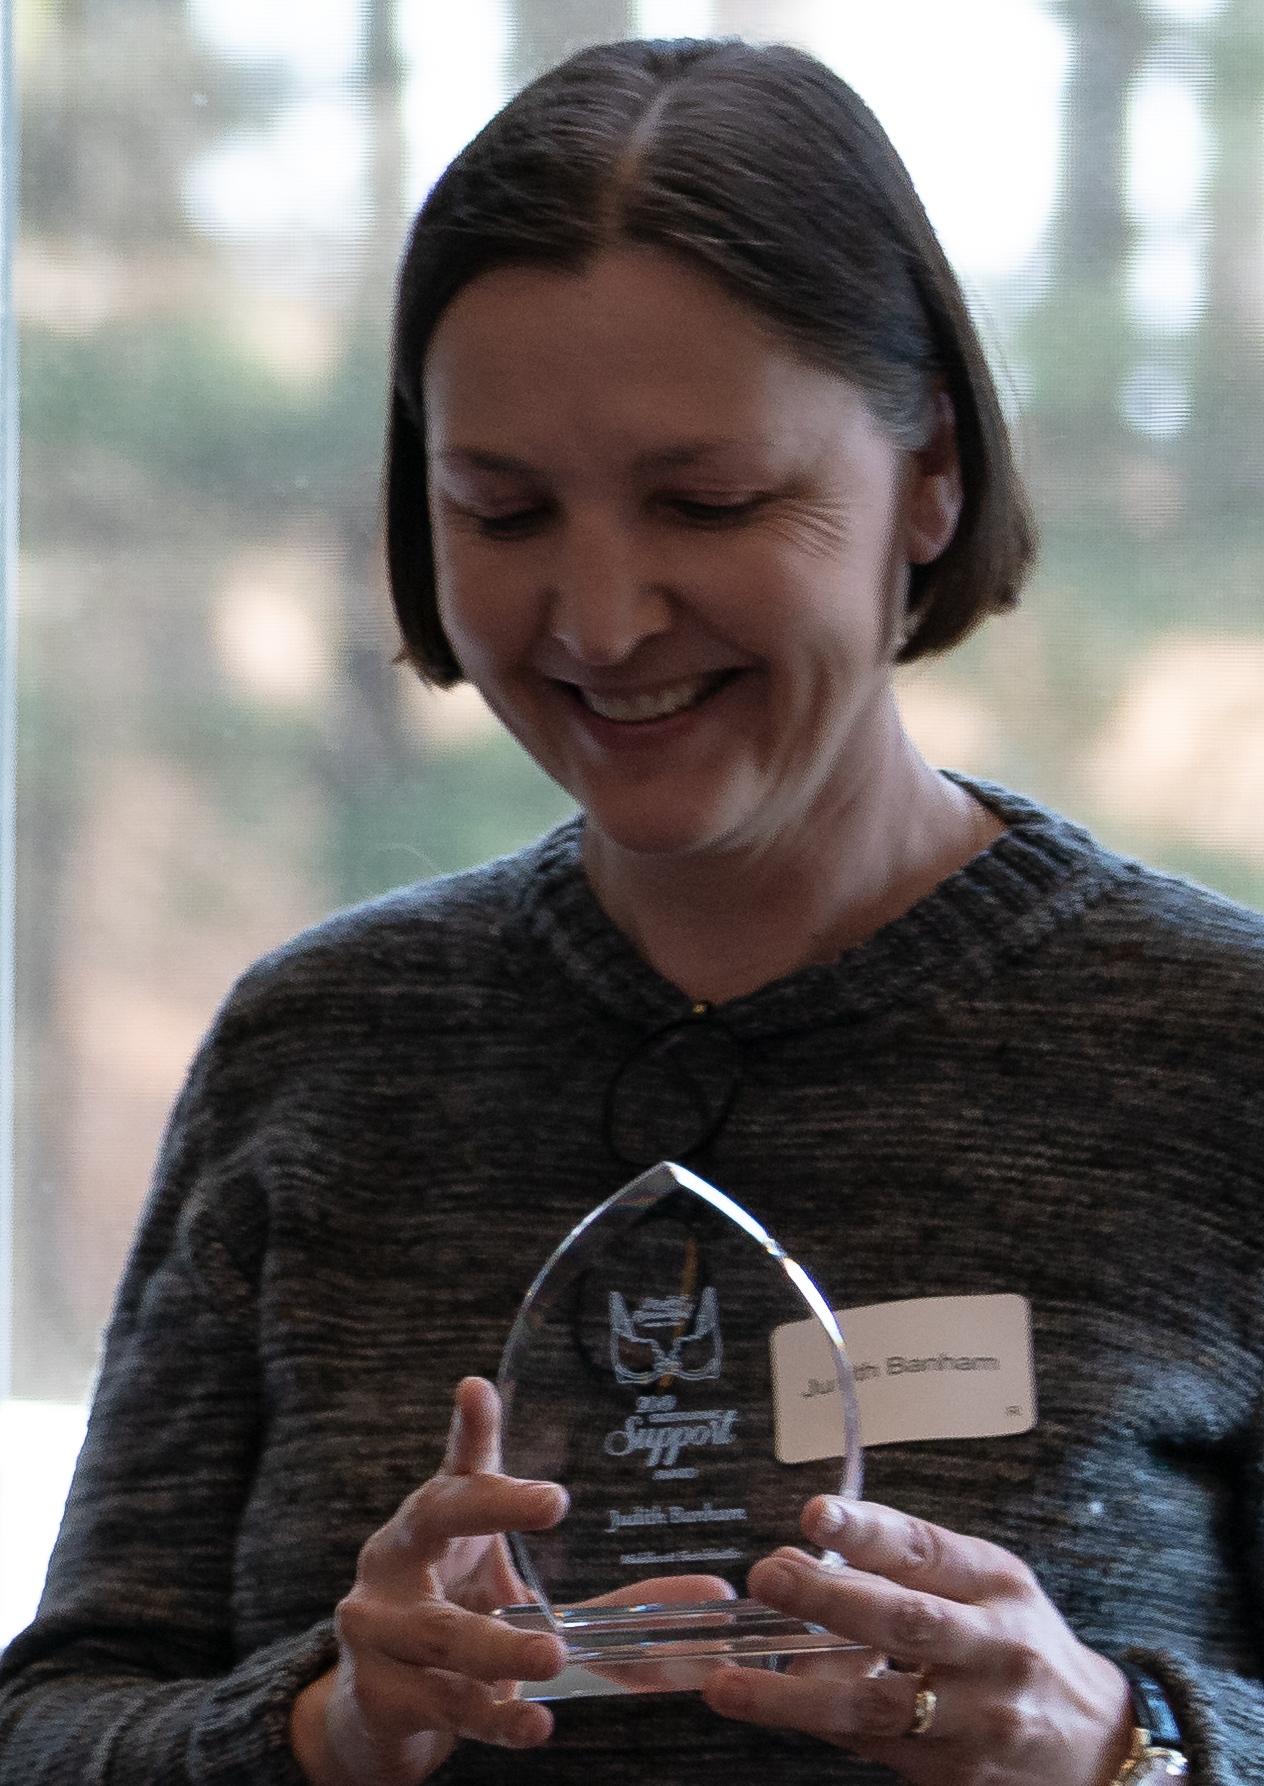 Judith Banham chuckling about her award featuring a bra!  PC: John Keep.